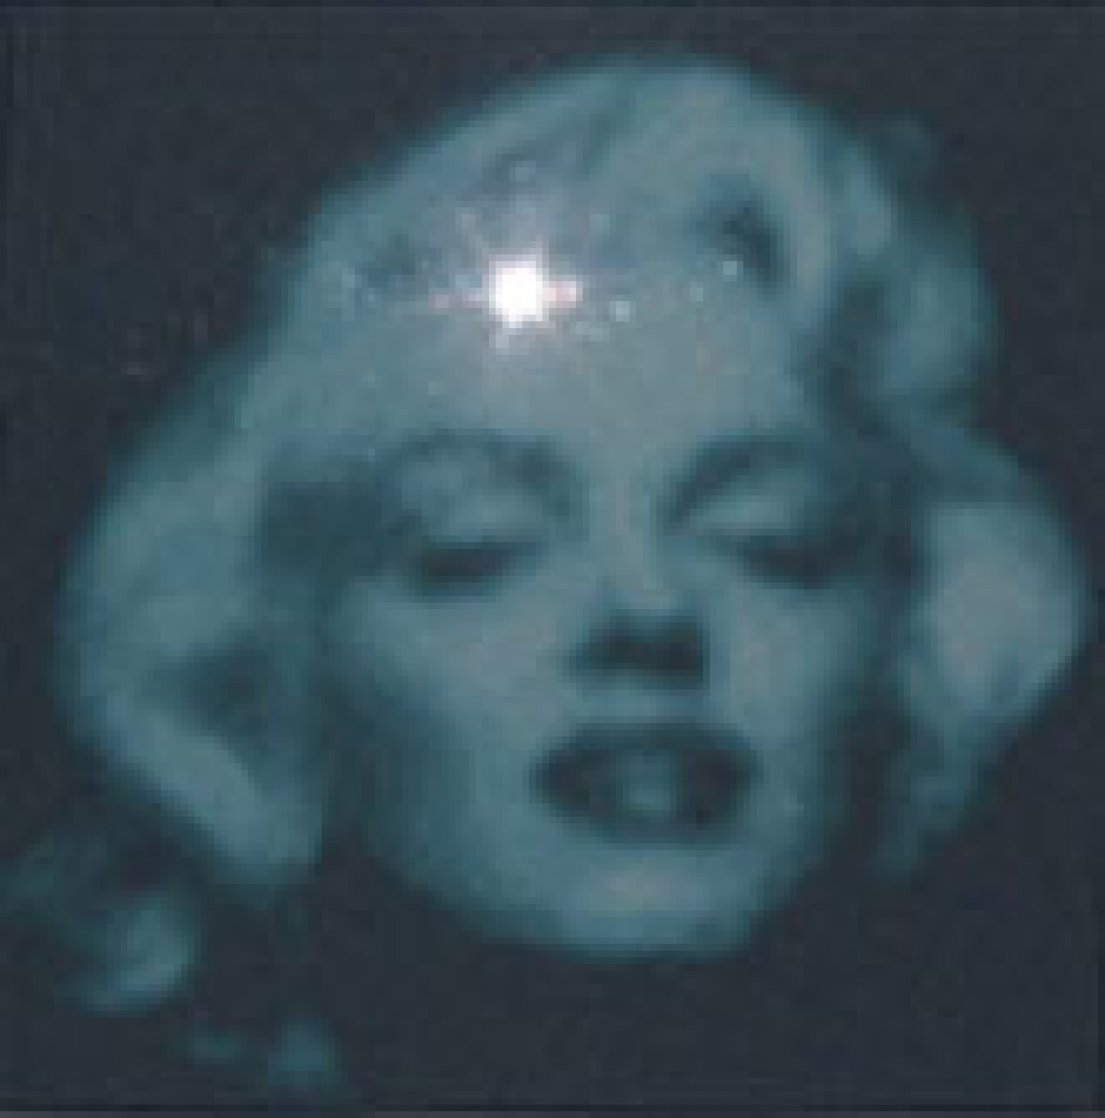 Star III (Marilyn Monroe) Limited Edition Print by  Yvaral